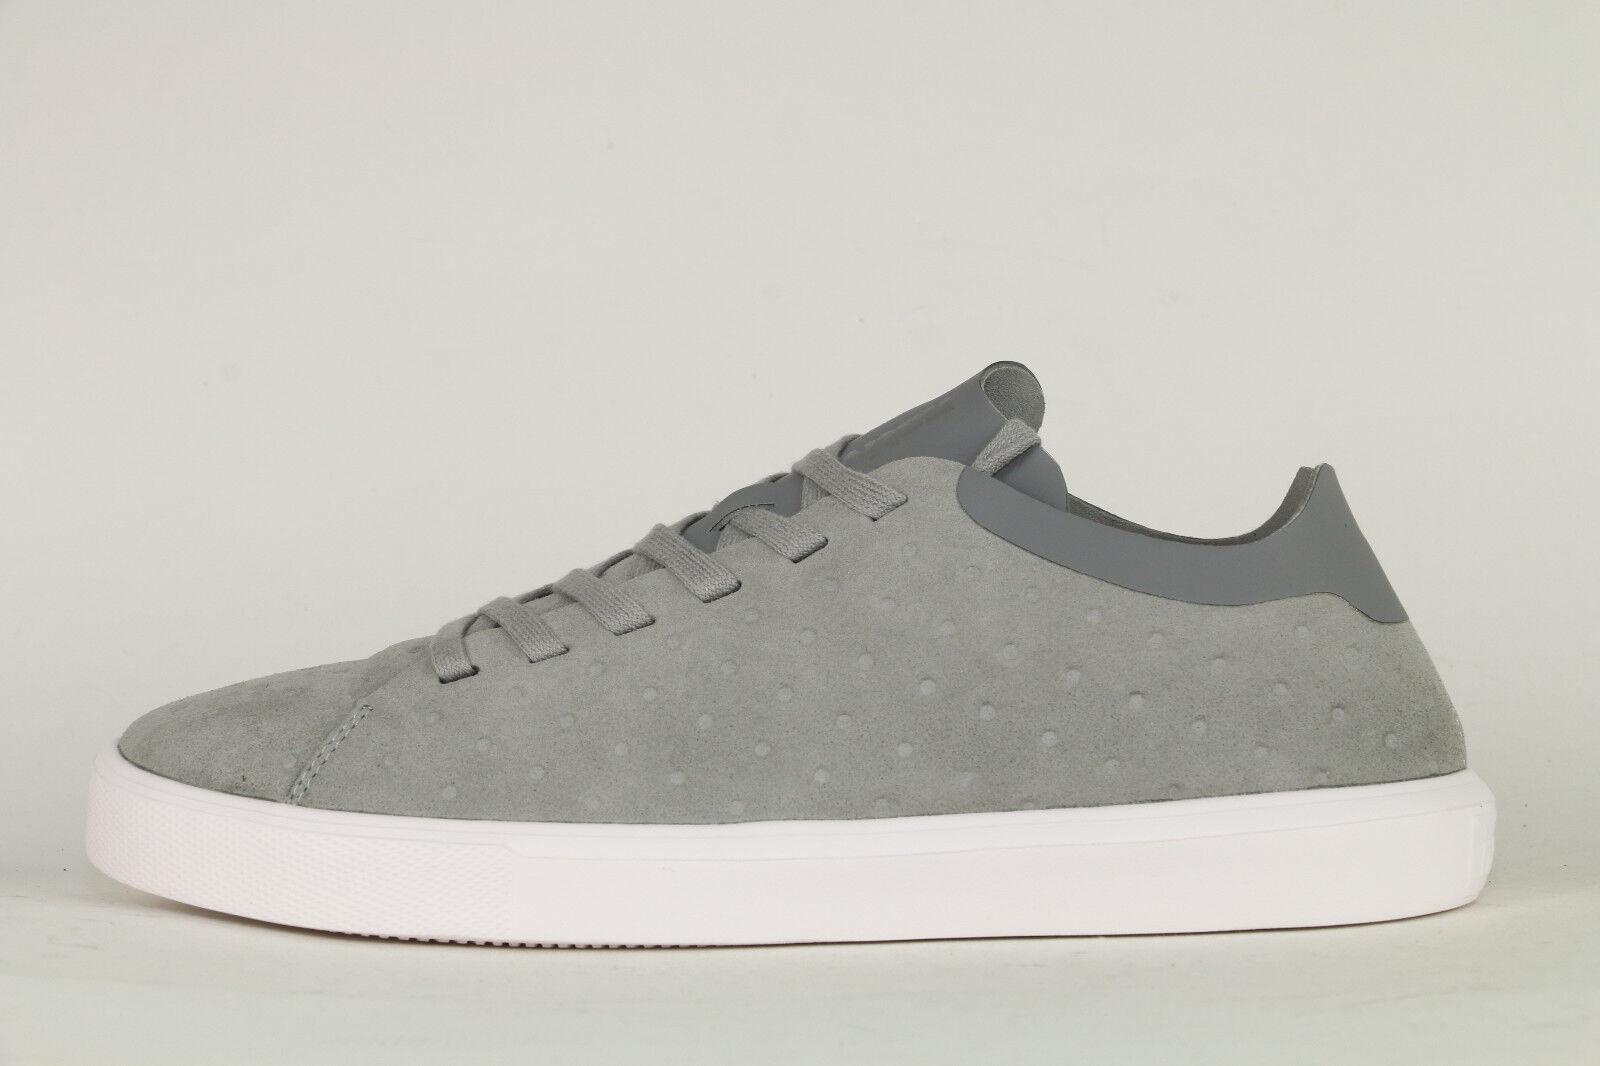 Native Monaco Low Pigeon Grey/Shell White - Sneaker - Herren - grau +NEU+